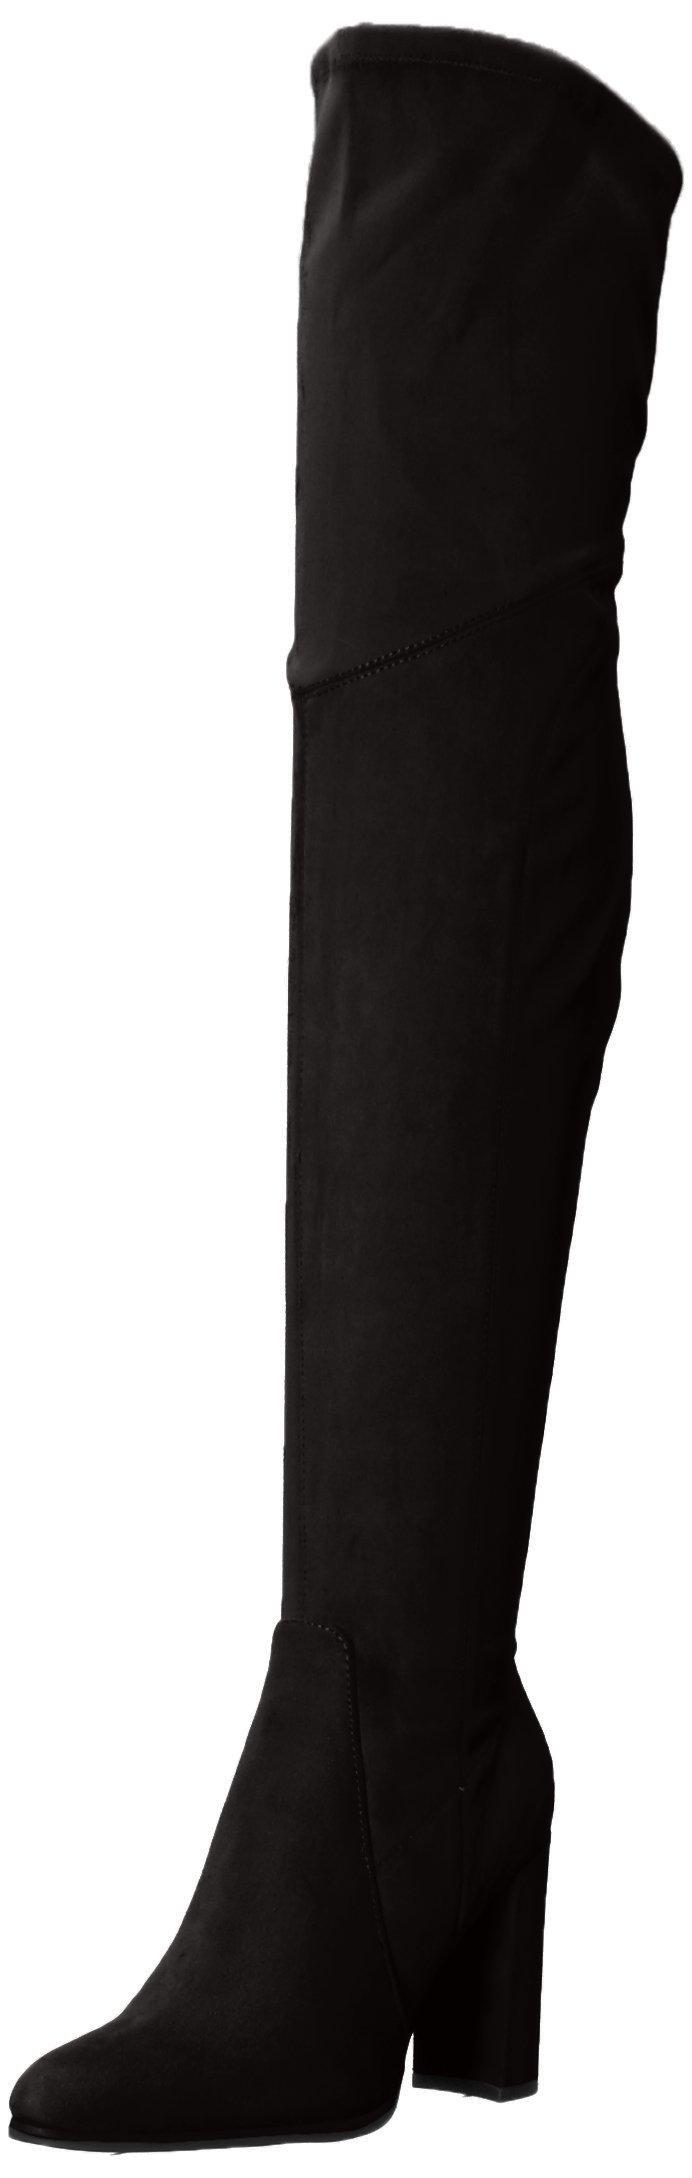 Marc Fisher Women's Nella Over The Knee Boot, Black, 7.5 Medium US